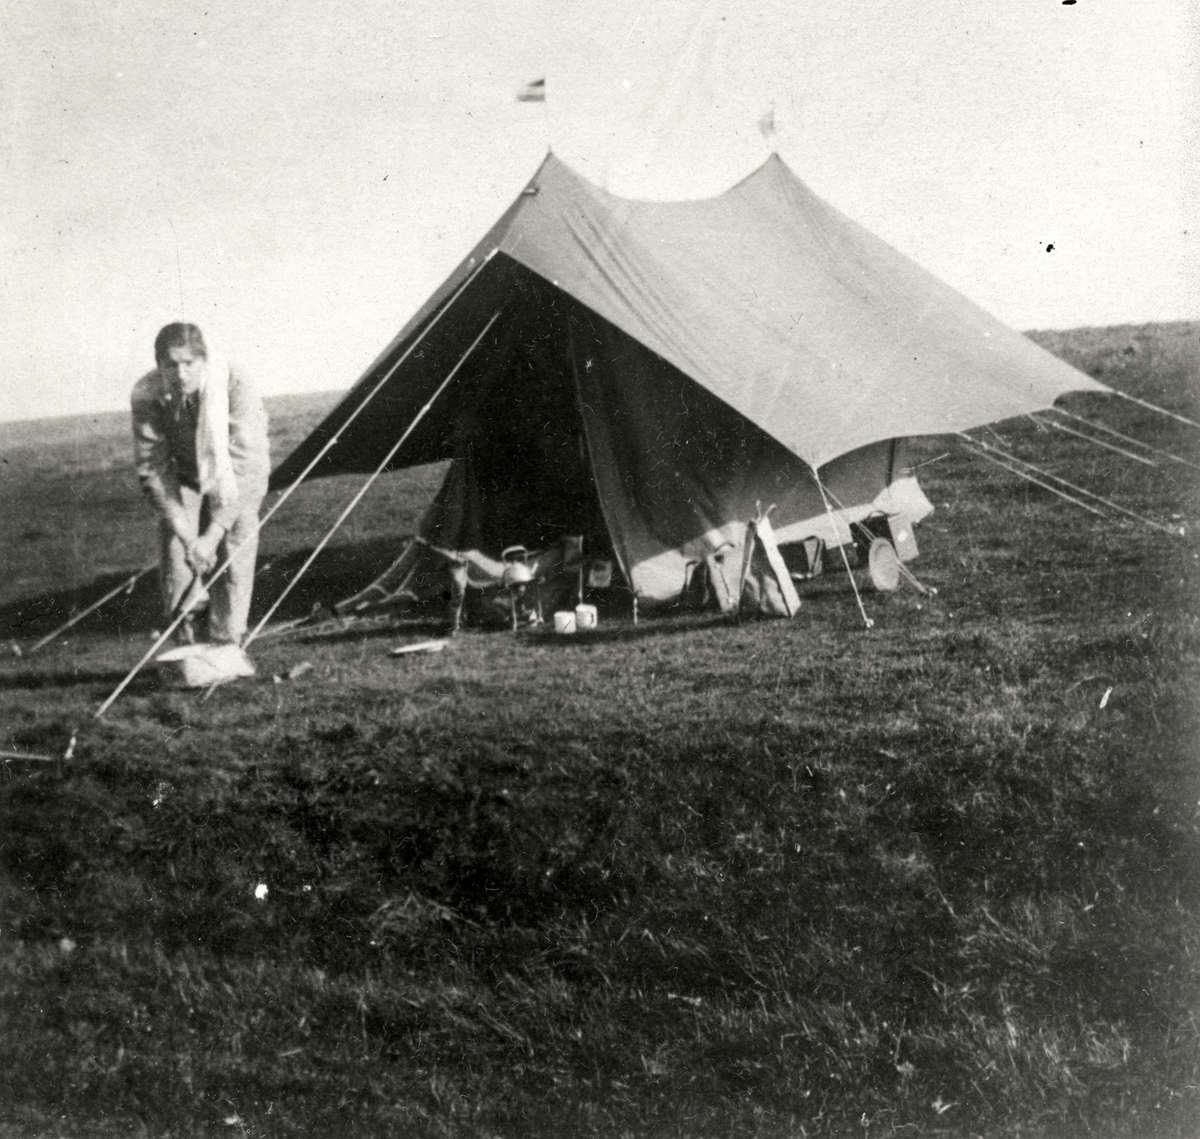 Rondom Oorlog Carl Denig Tijdens Kamperen In Engeland Werd